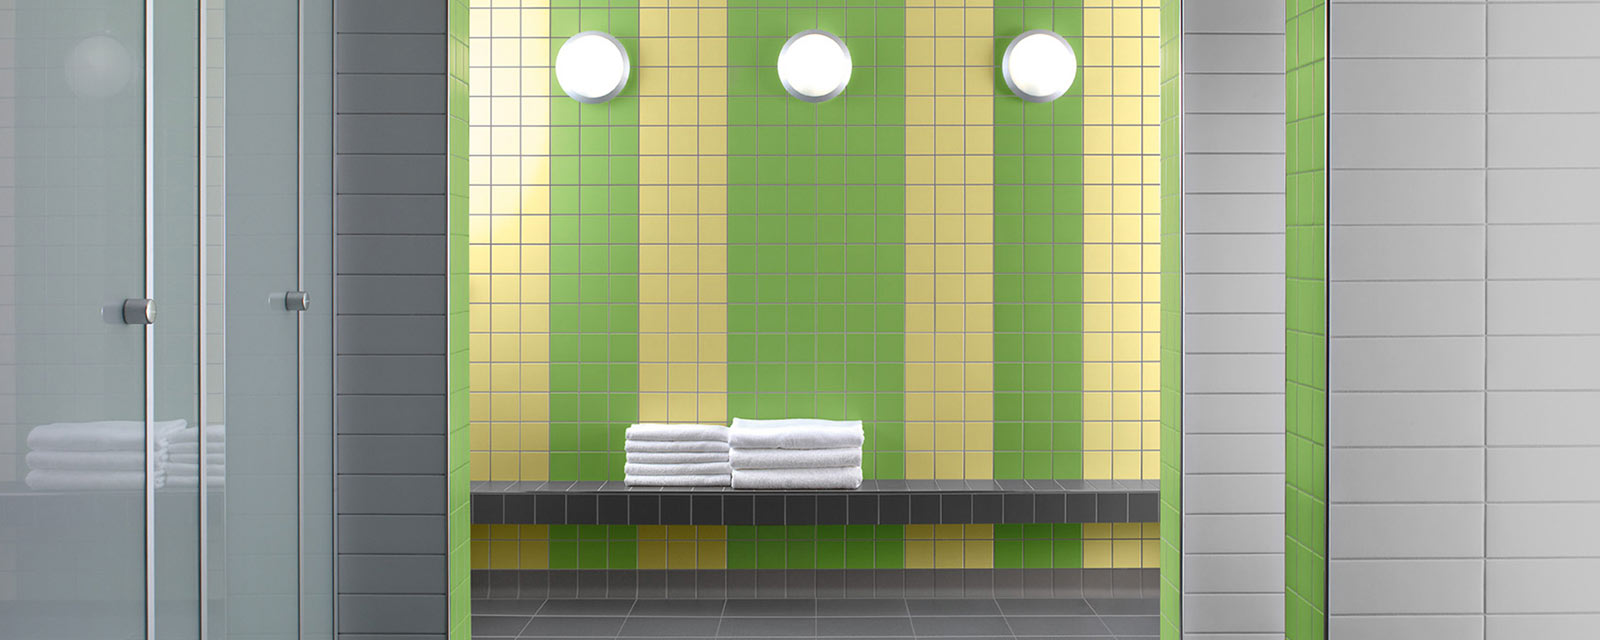 Carrelage Pour Collectivite Pro Architectura Villeroy Boch Guide Artisan